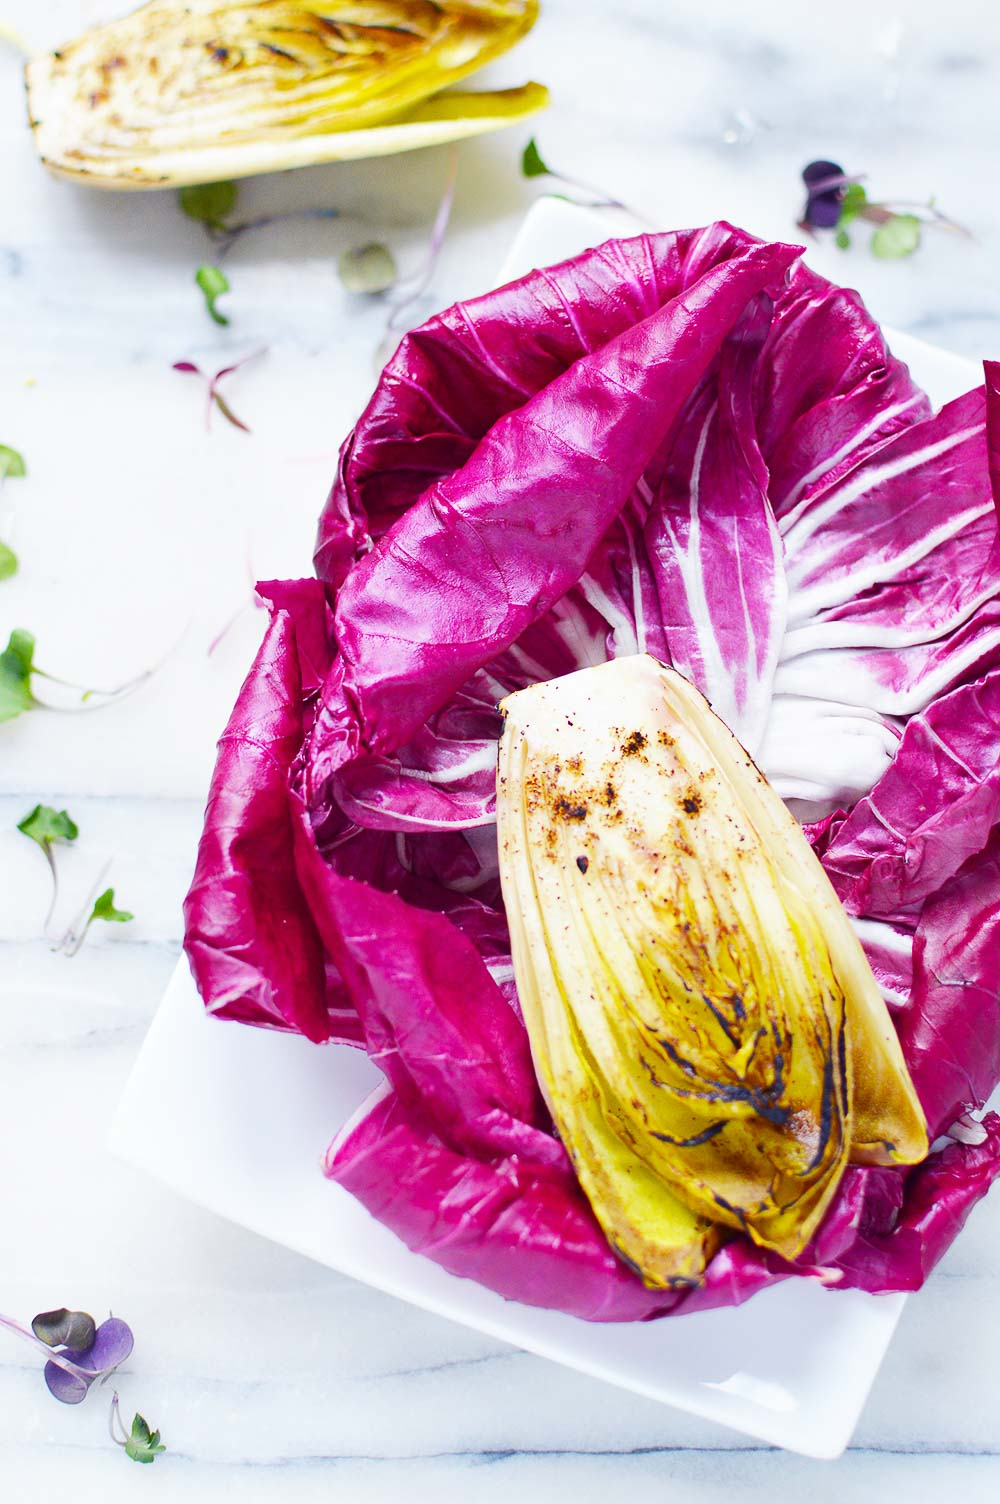 Radicchio and Endive Salad - so fresh, refreshing, and colorful!